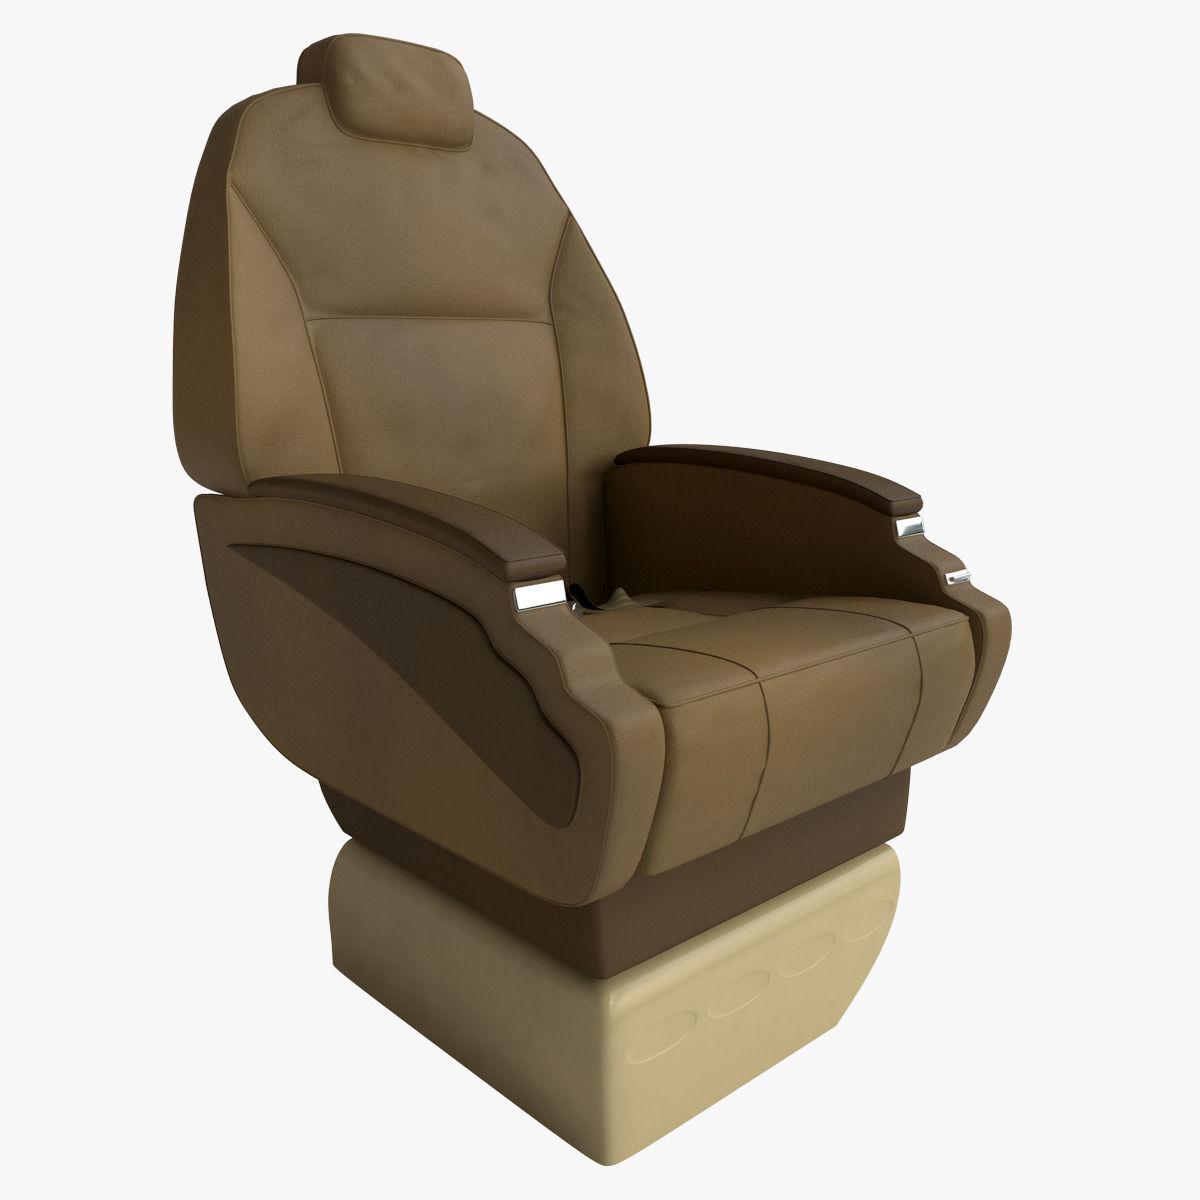 Aircraft Seat | 3D model